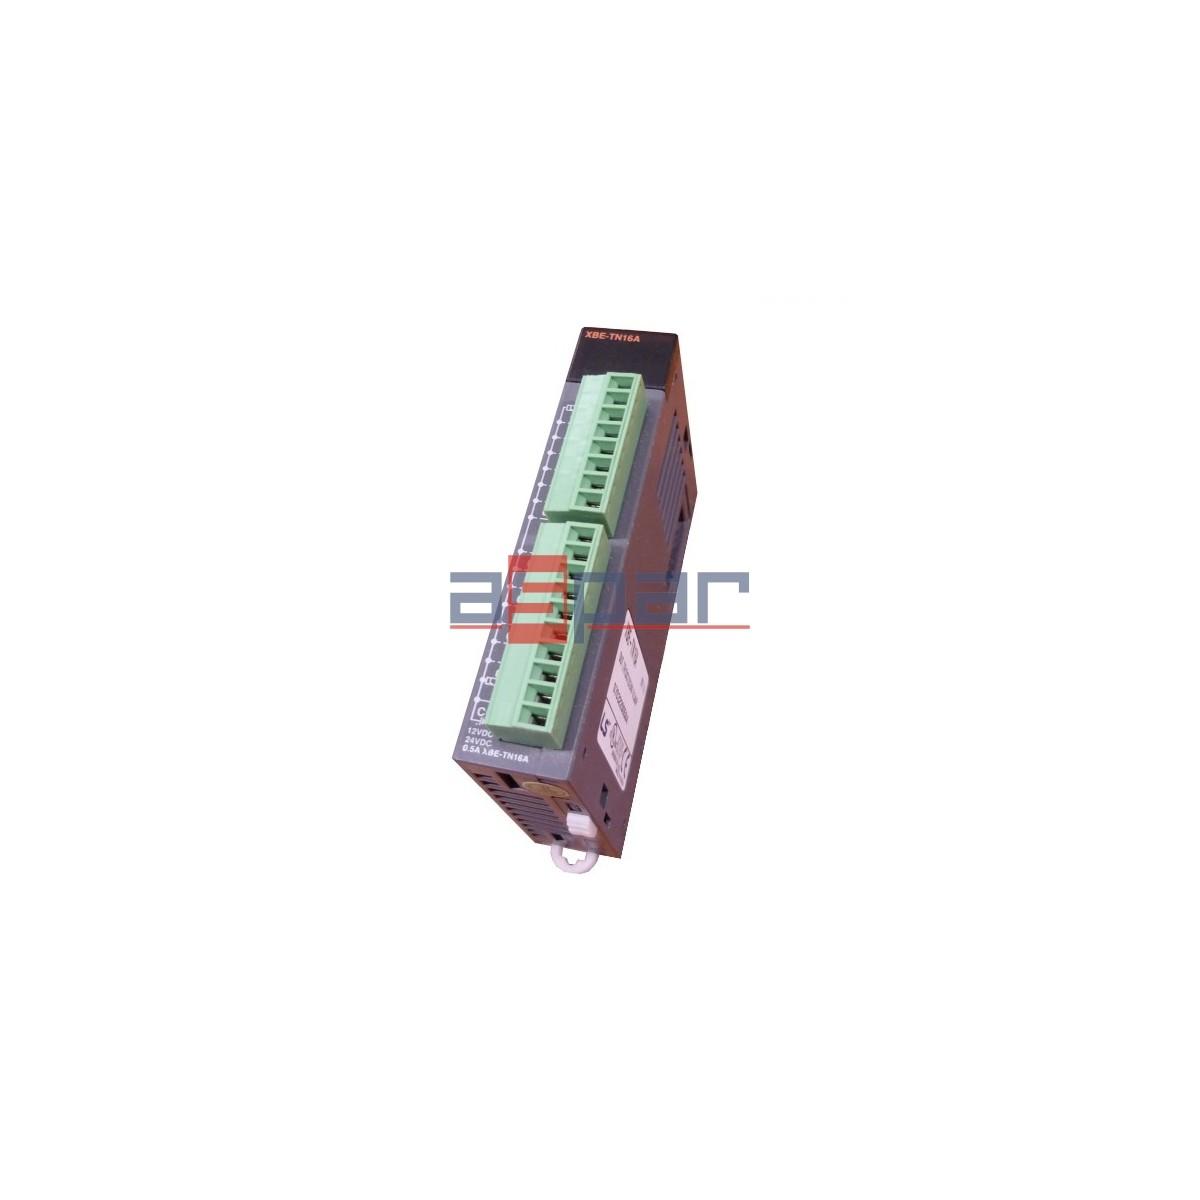 XBE-TN16A - 16-ch sink transistor outputs (NPN)